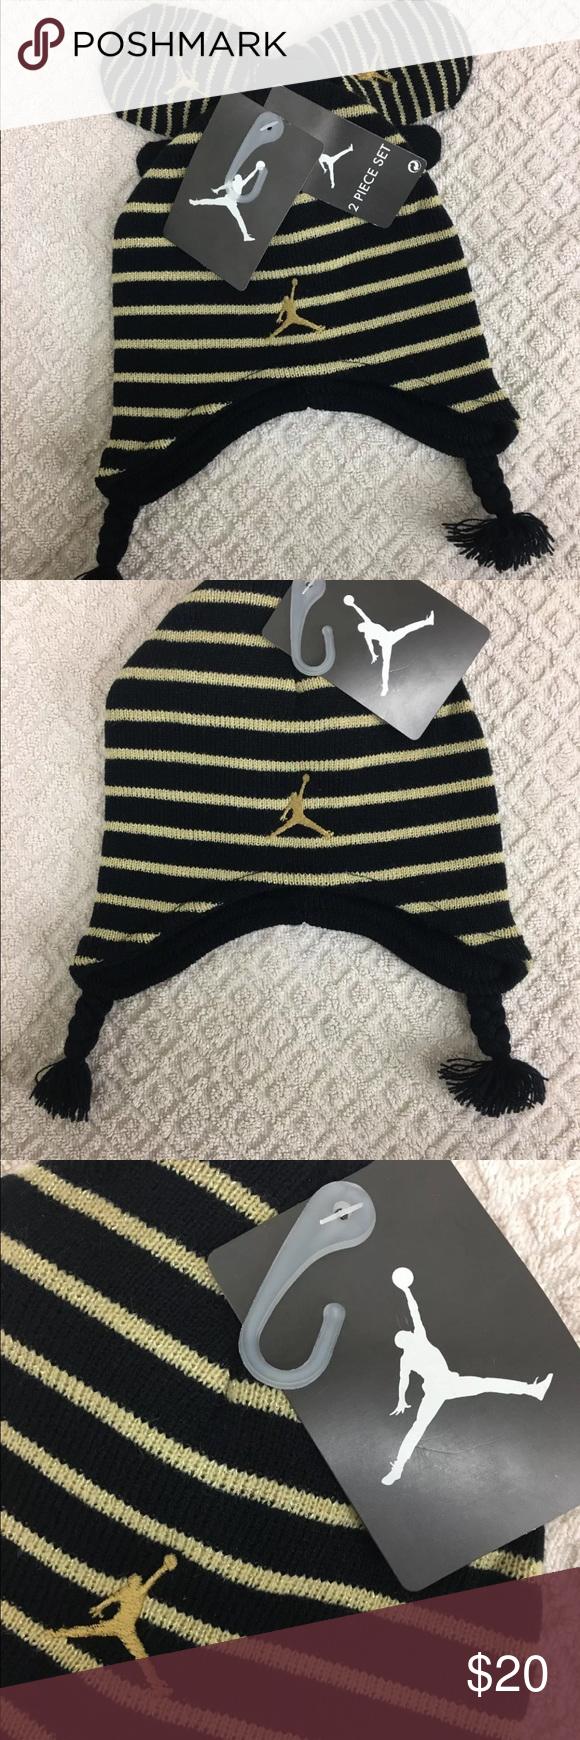 76728035b16 Jordan Boy s 2 4T Striped Beanie Hat  amp  Mittens Set NIKE Jordan Peruvian  Black